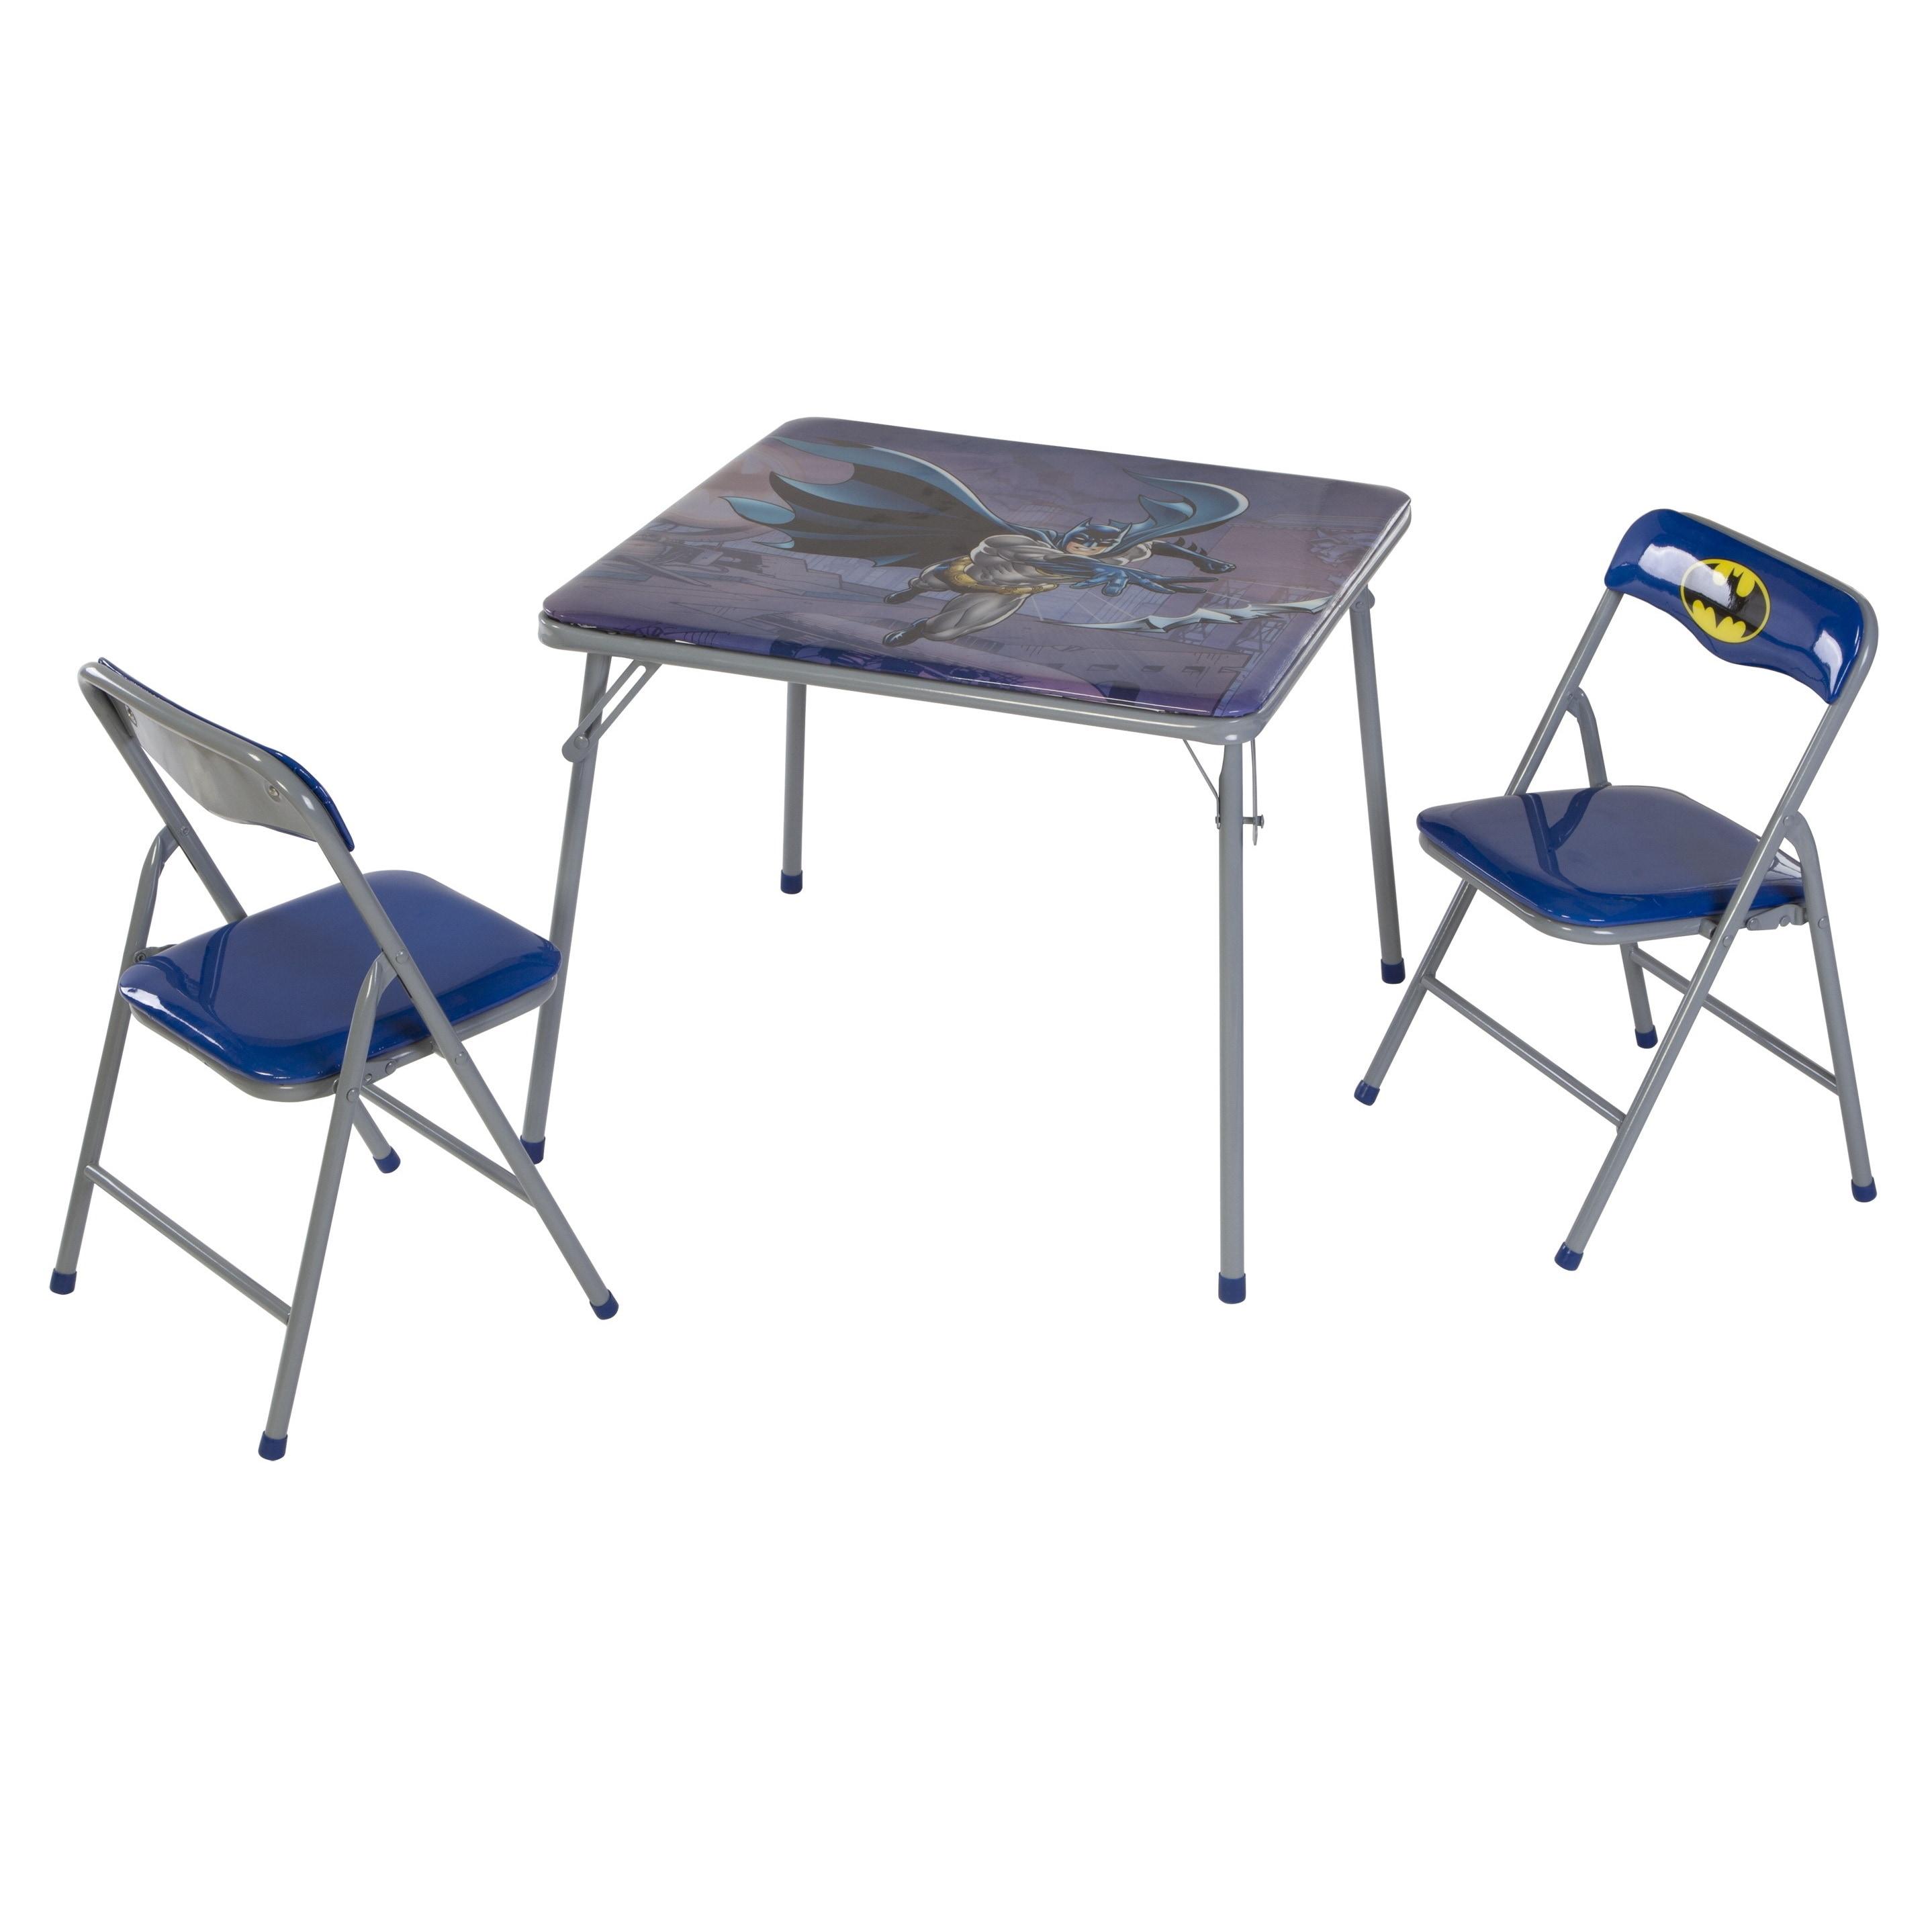 - Shop O'Kids 'Batman' Children's Boys' Metal Table And Chairs Set